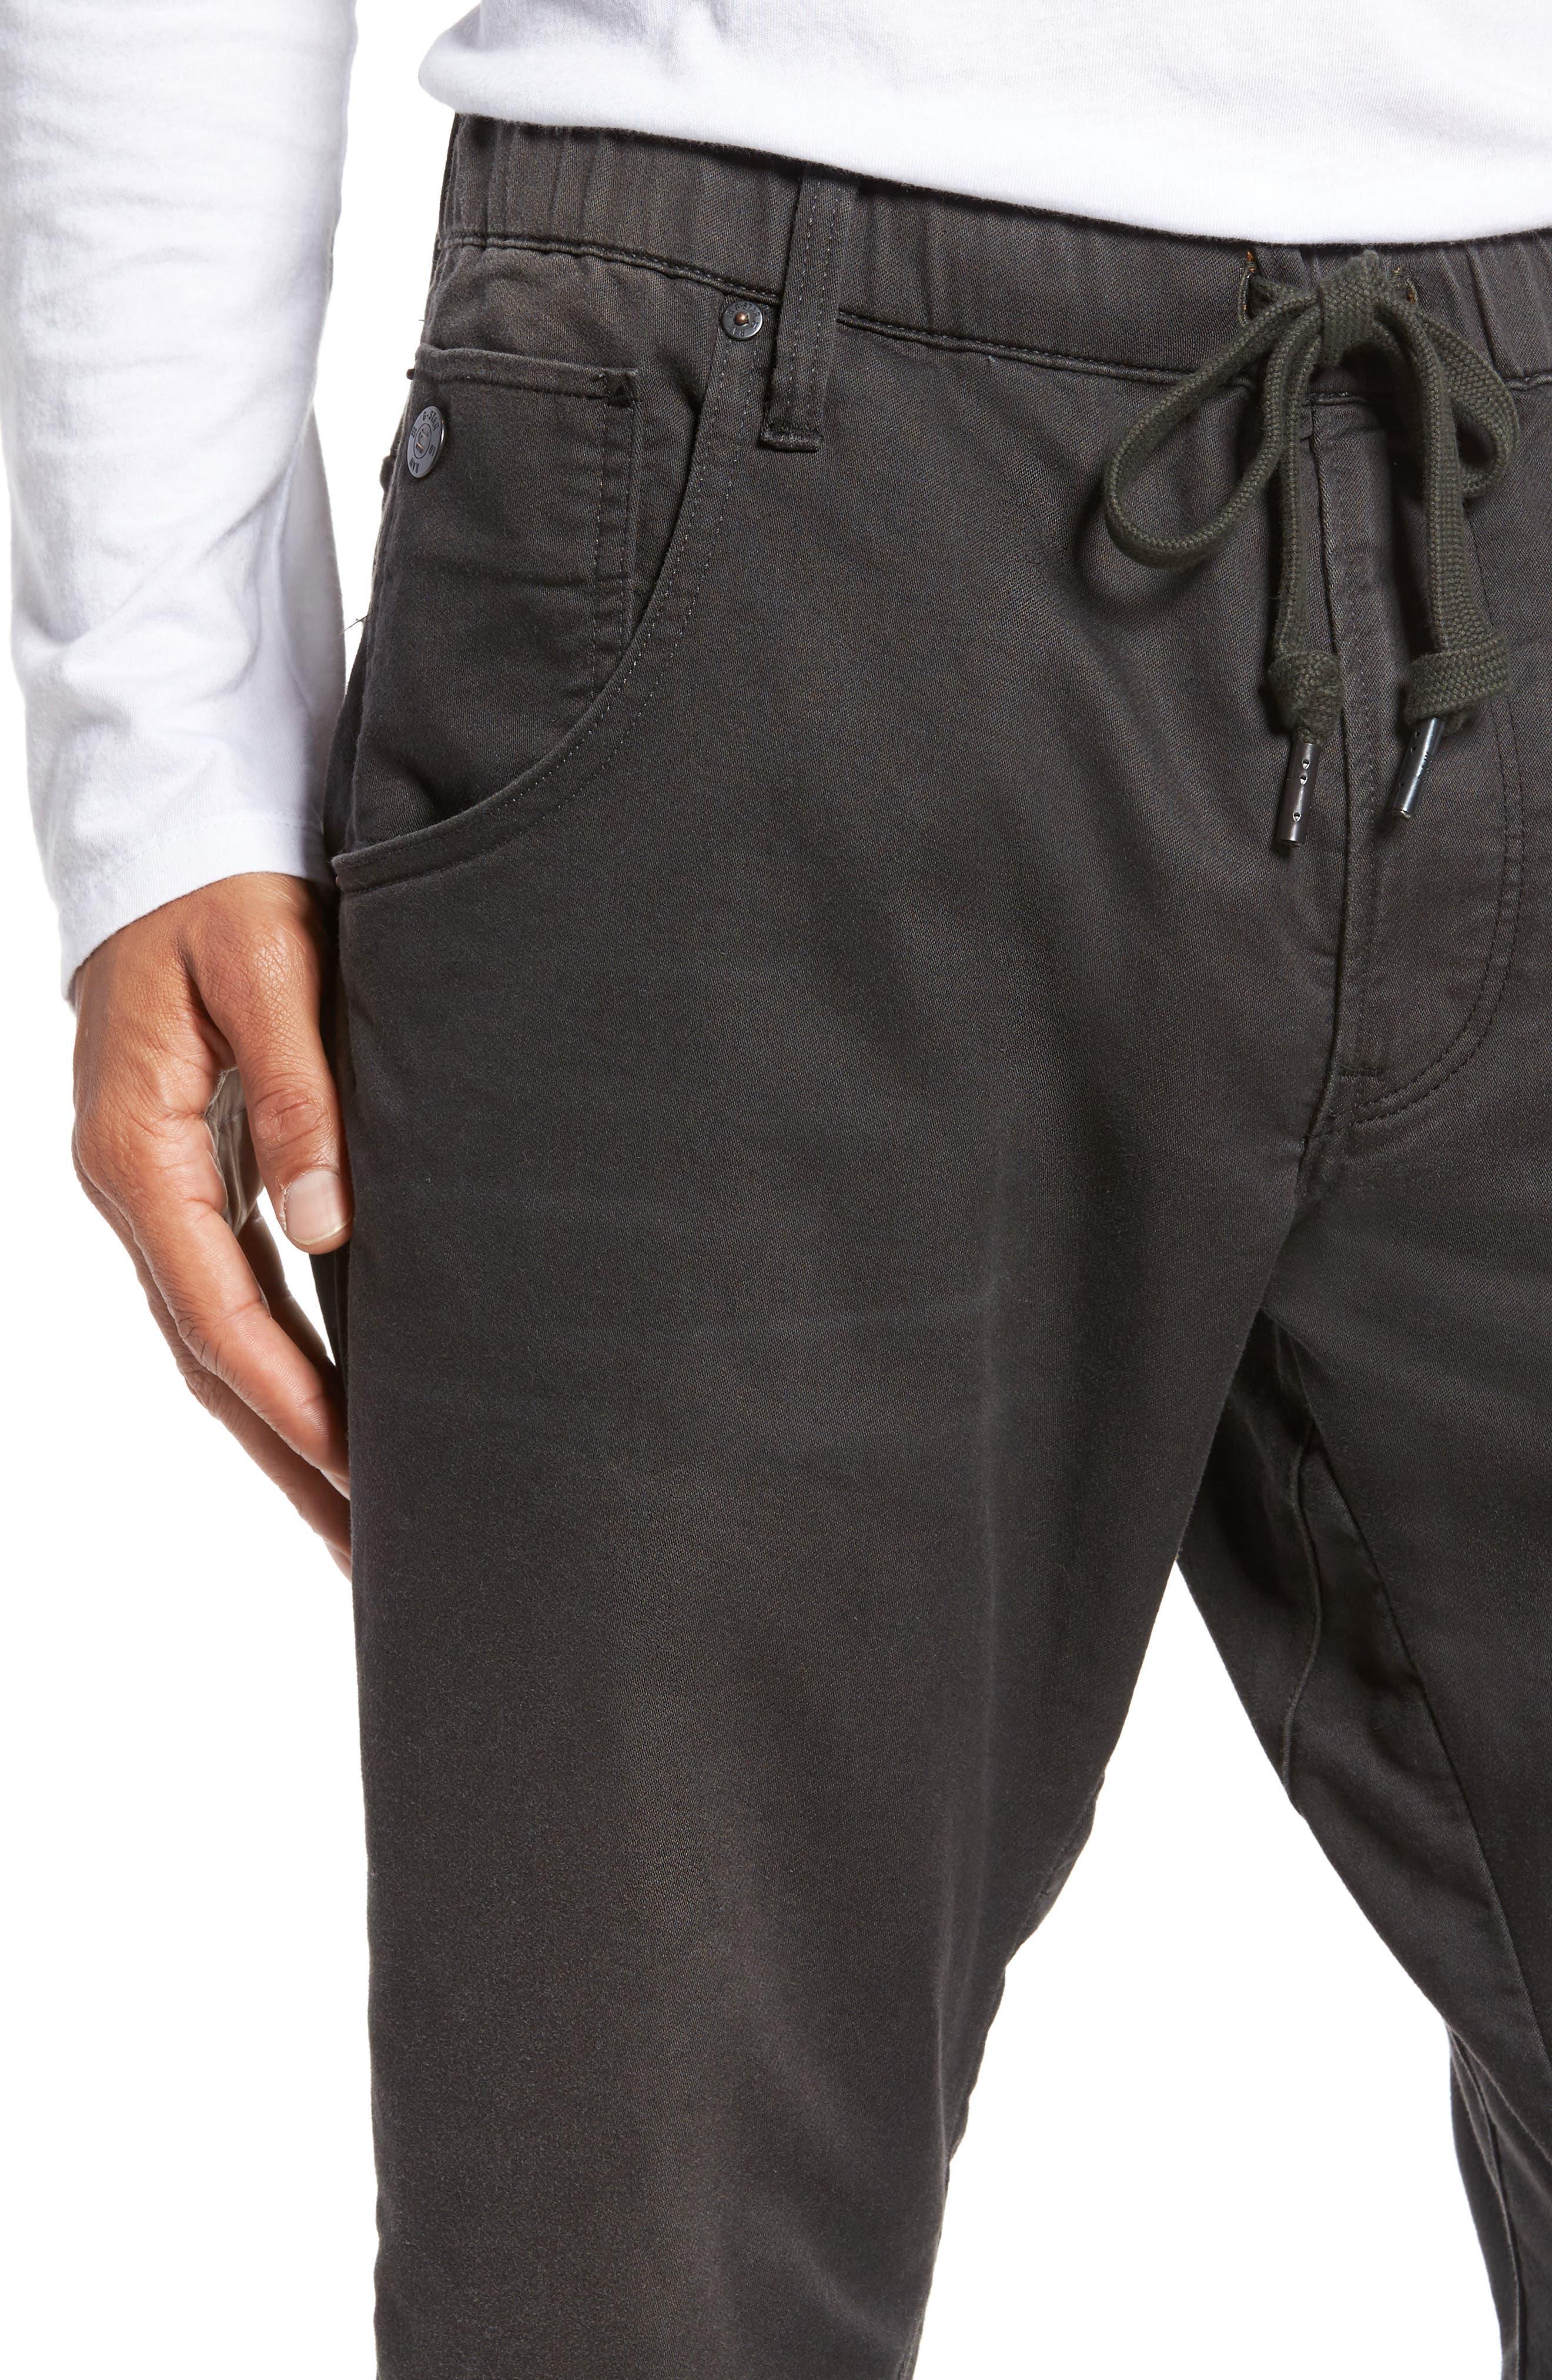 Arc 3D Sport Tapered Fit Jogger Pants,                             Alternate thumbnail 4, color,                             020